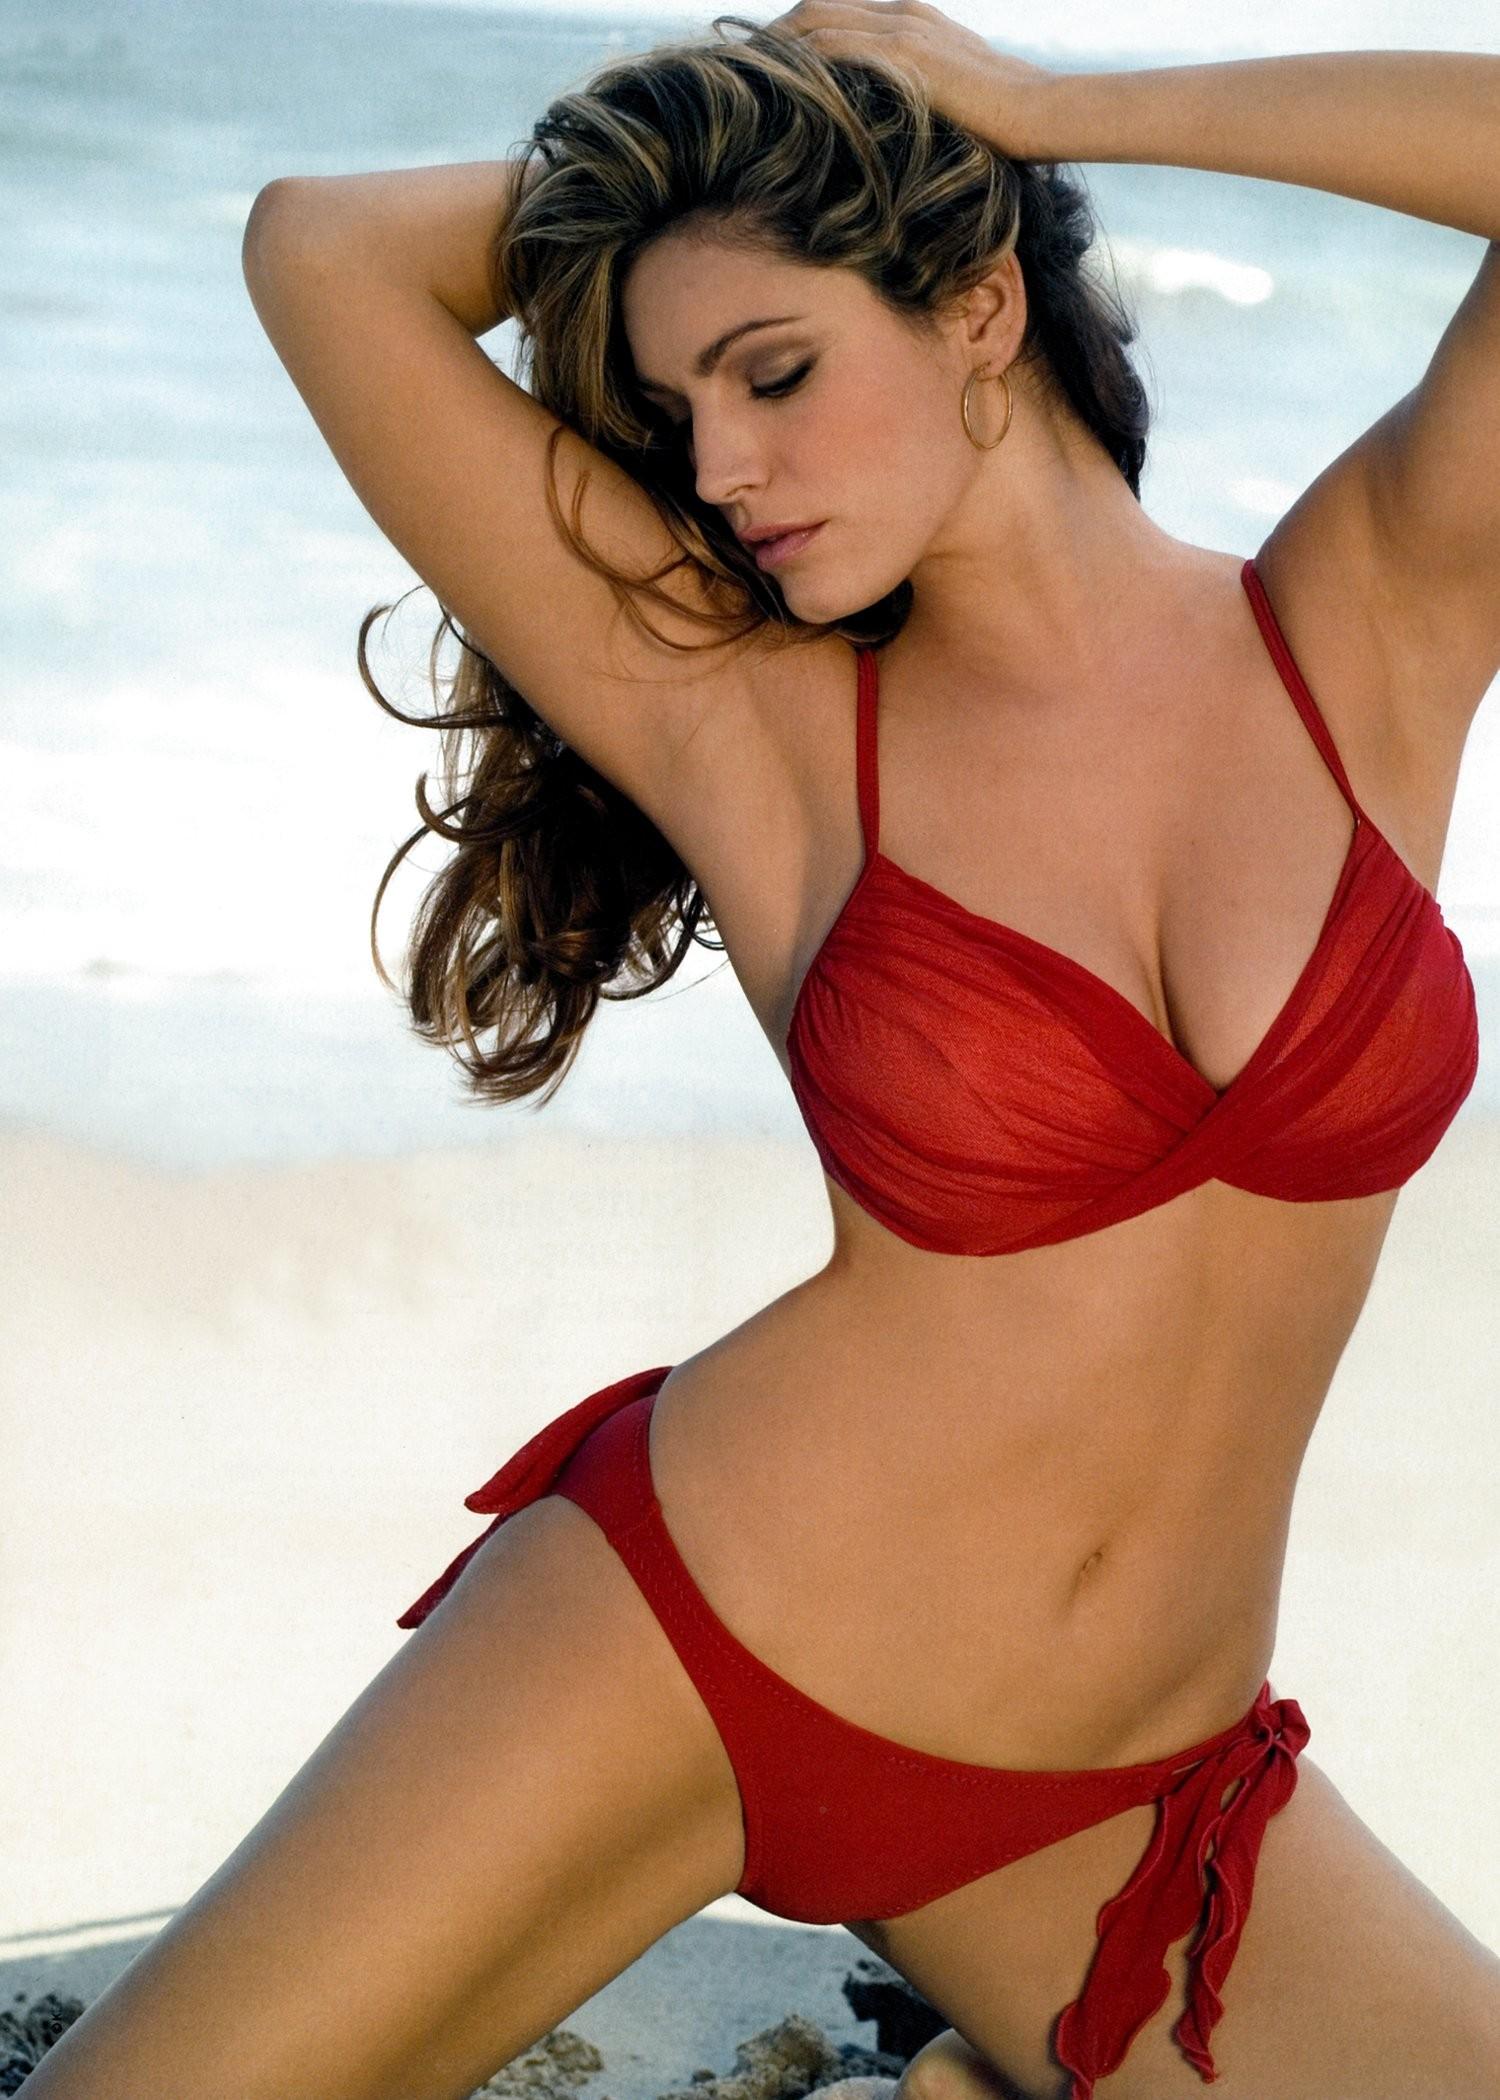 Bikini Amanda Brooks nude (52 pics) Gallery, iCloud, panties